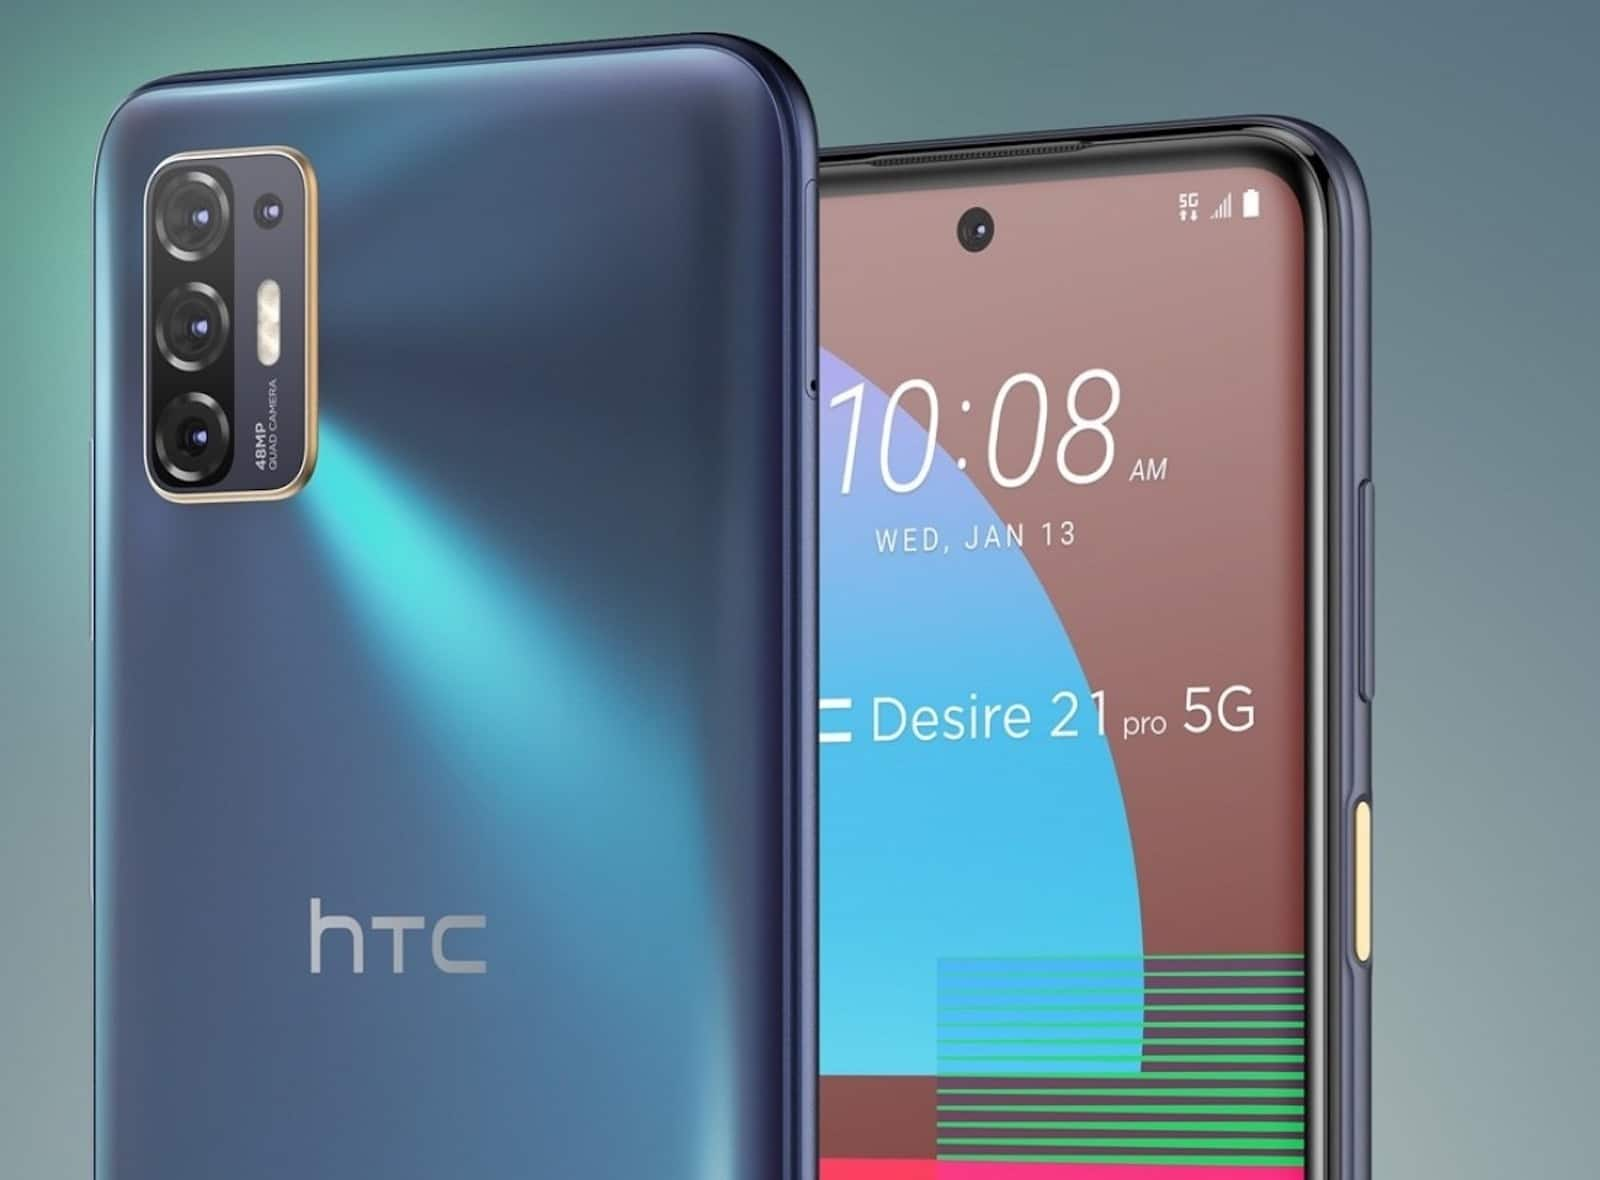 HTC desire pro 5g